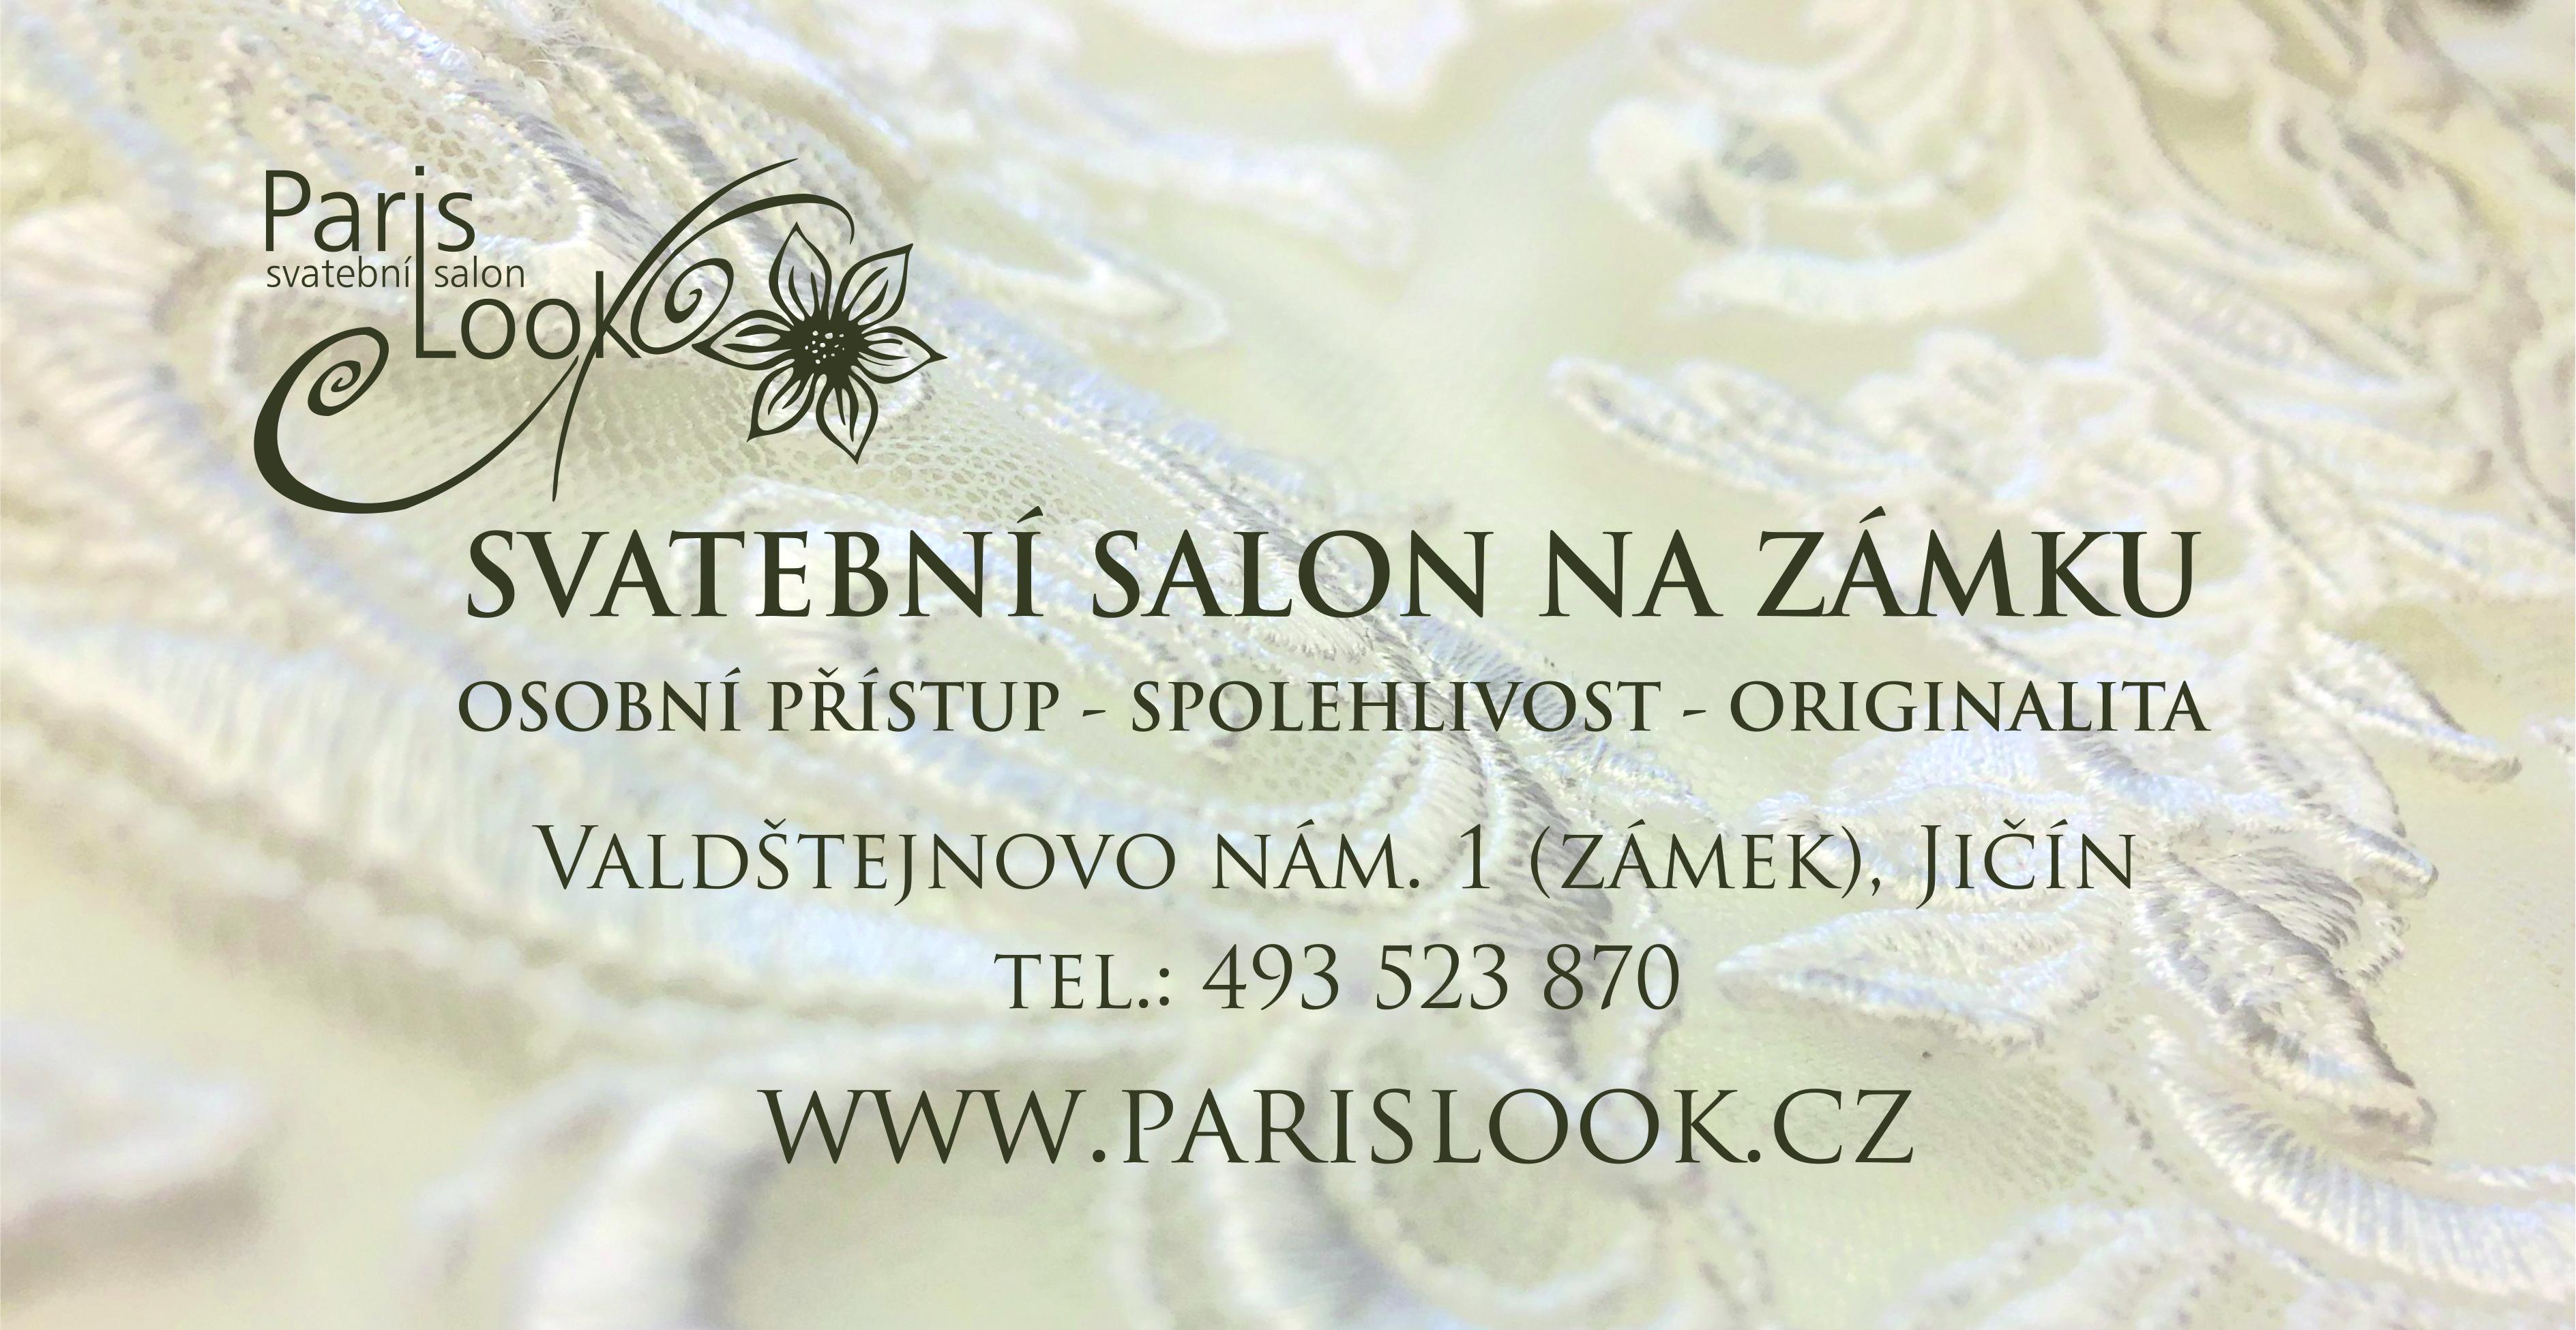 ParisLook Svatební salon Jičín